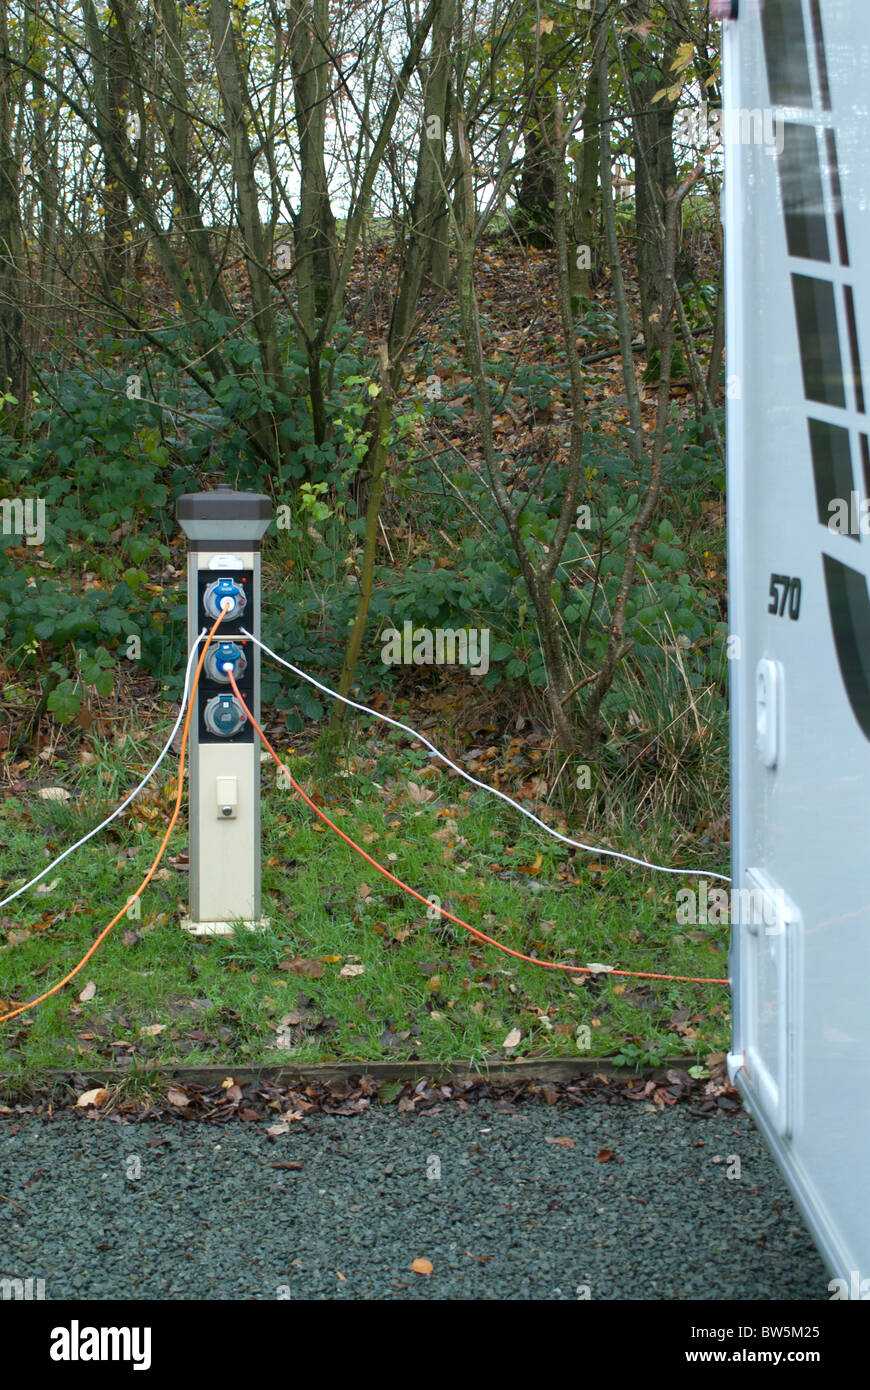 hight resolution of caravan electric hook up stock image